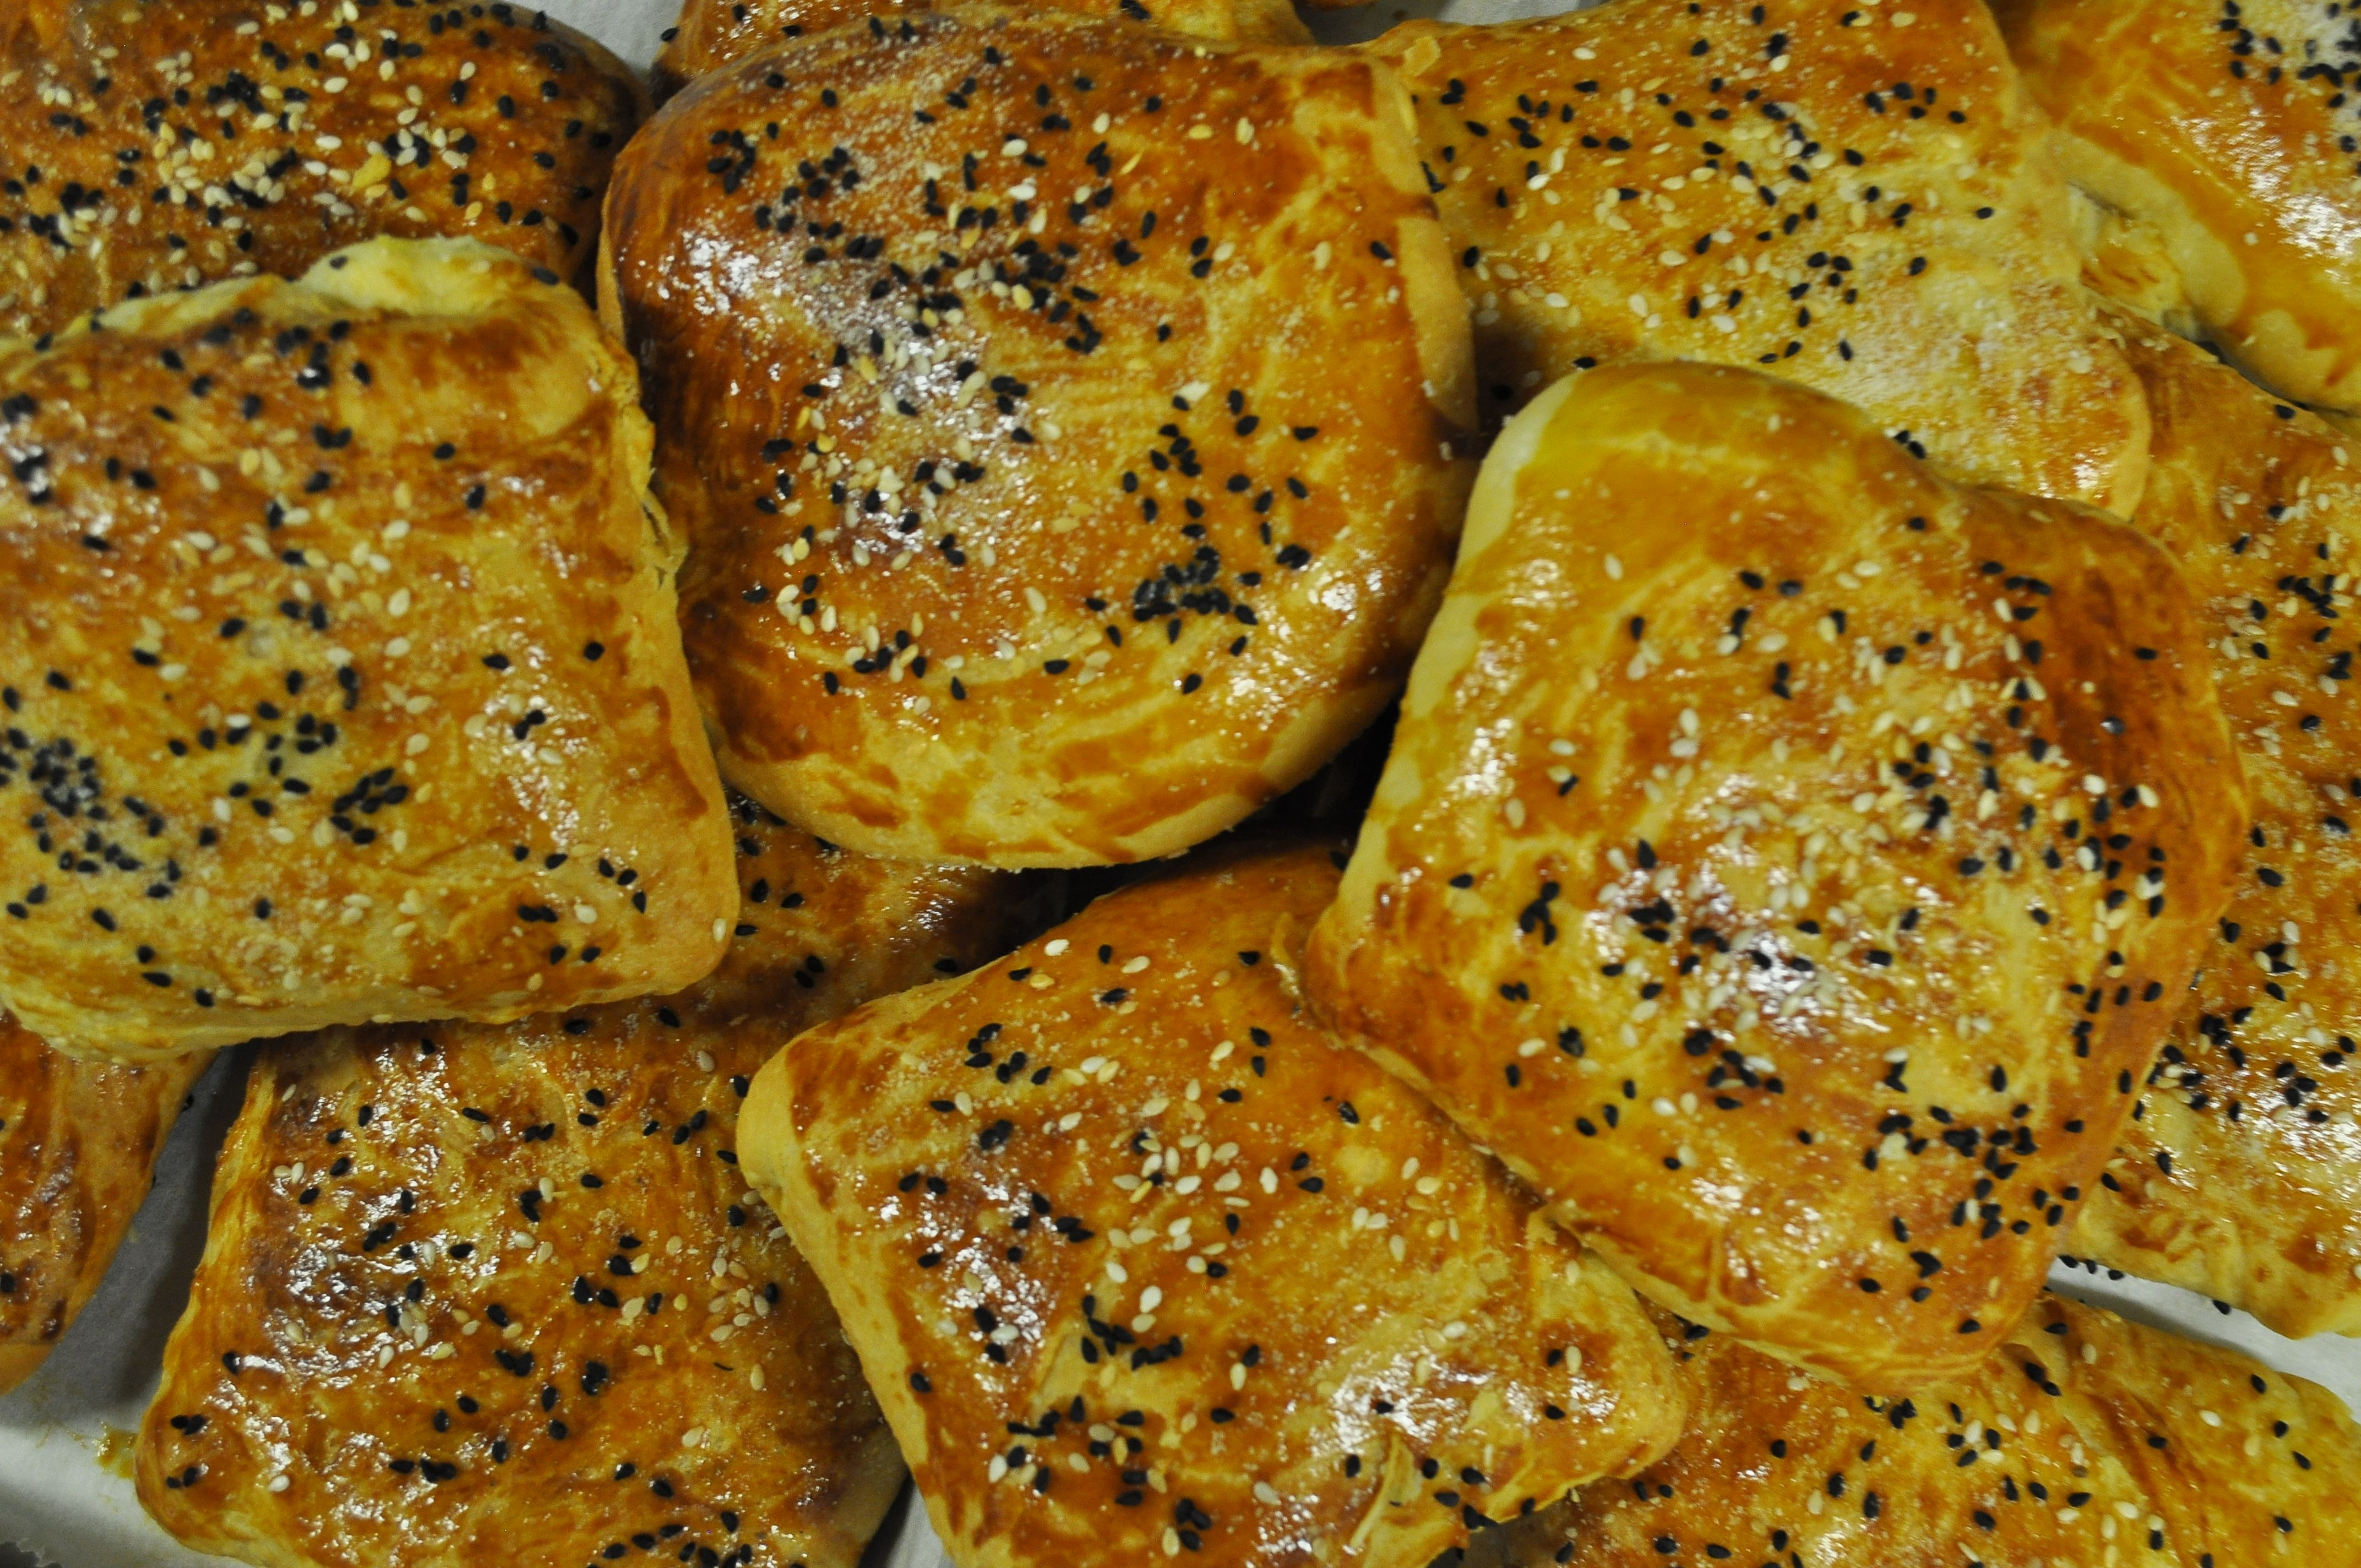 cihangir kahvaltı, Istanbul Brunch, Taksim Kahvaltı, cihangir kahvaltı